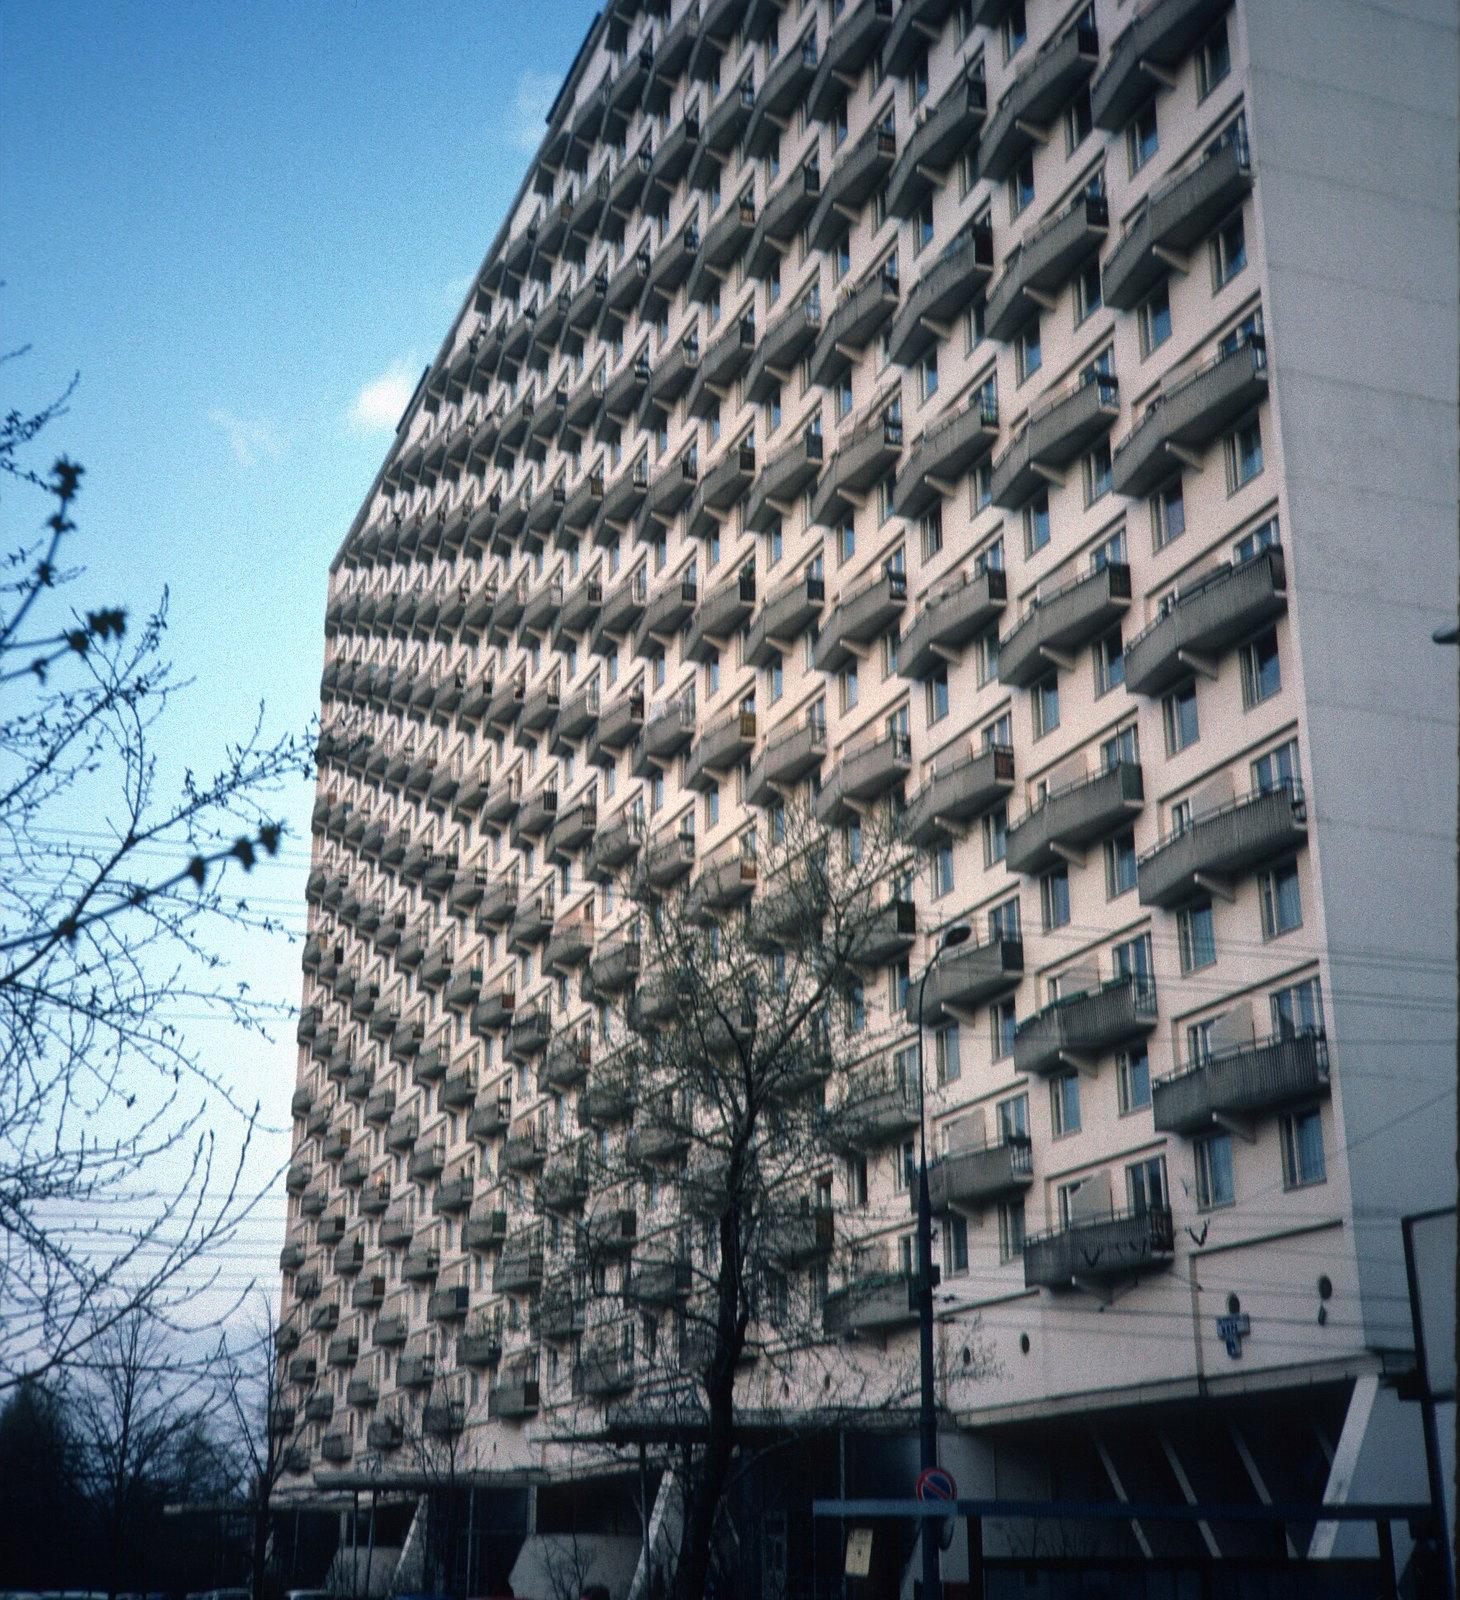 Проспект Мира, 184 корпус 2